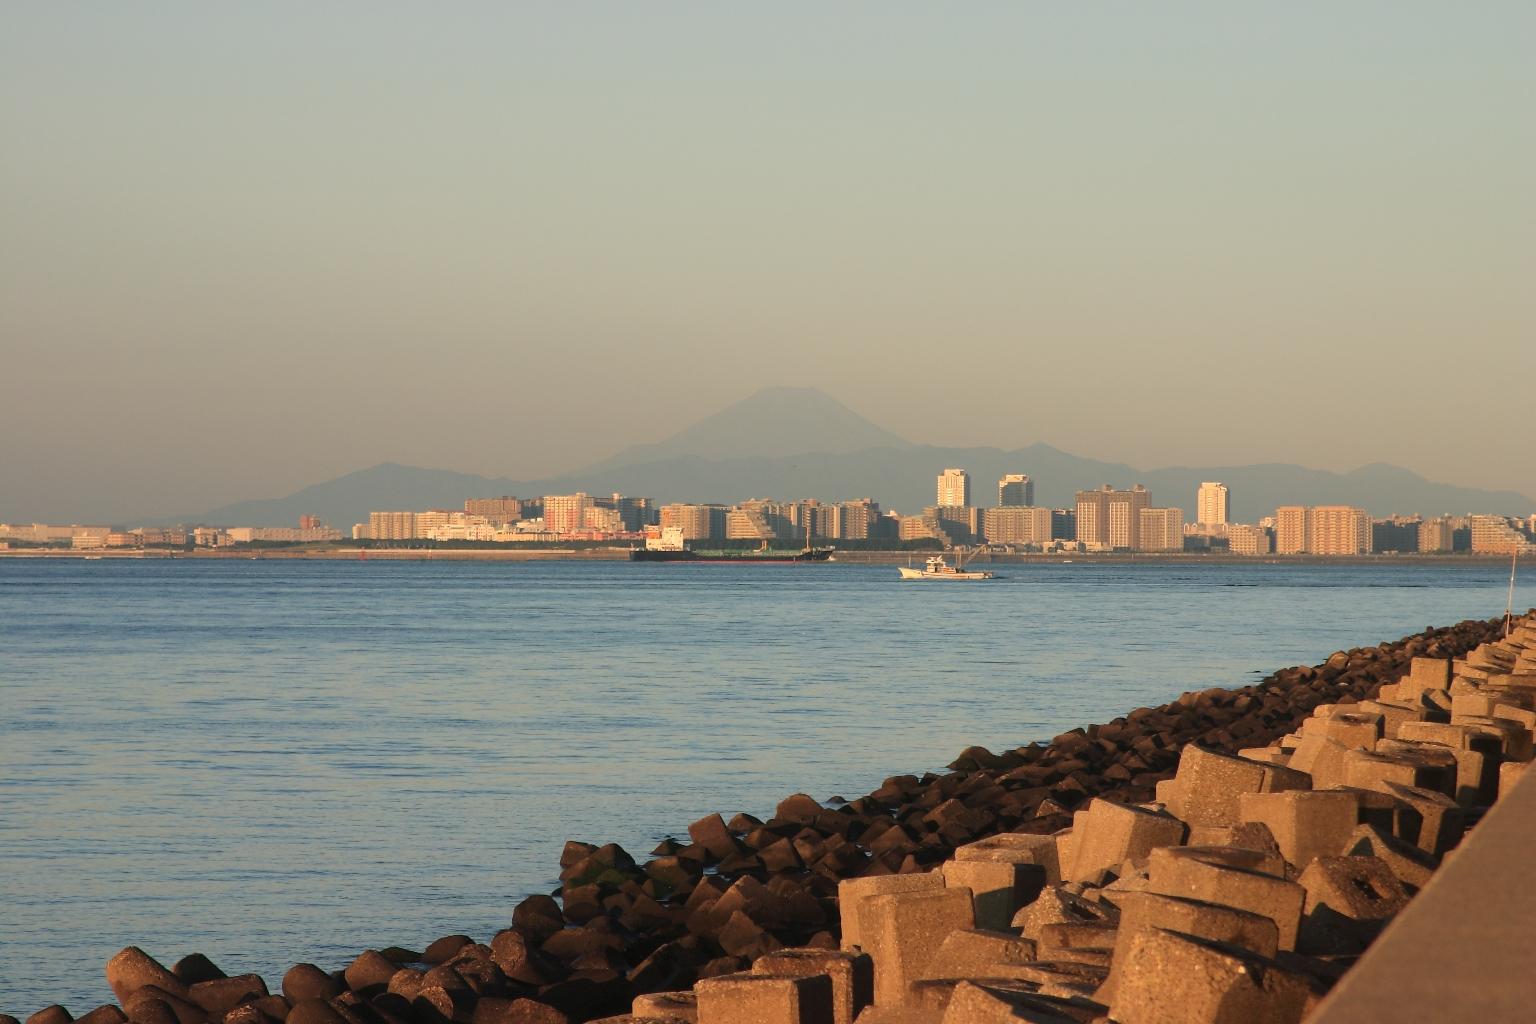 富士山と貨物船